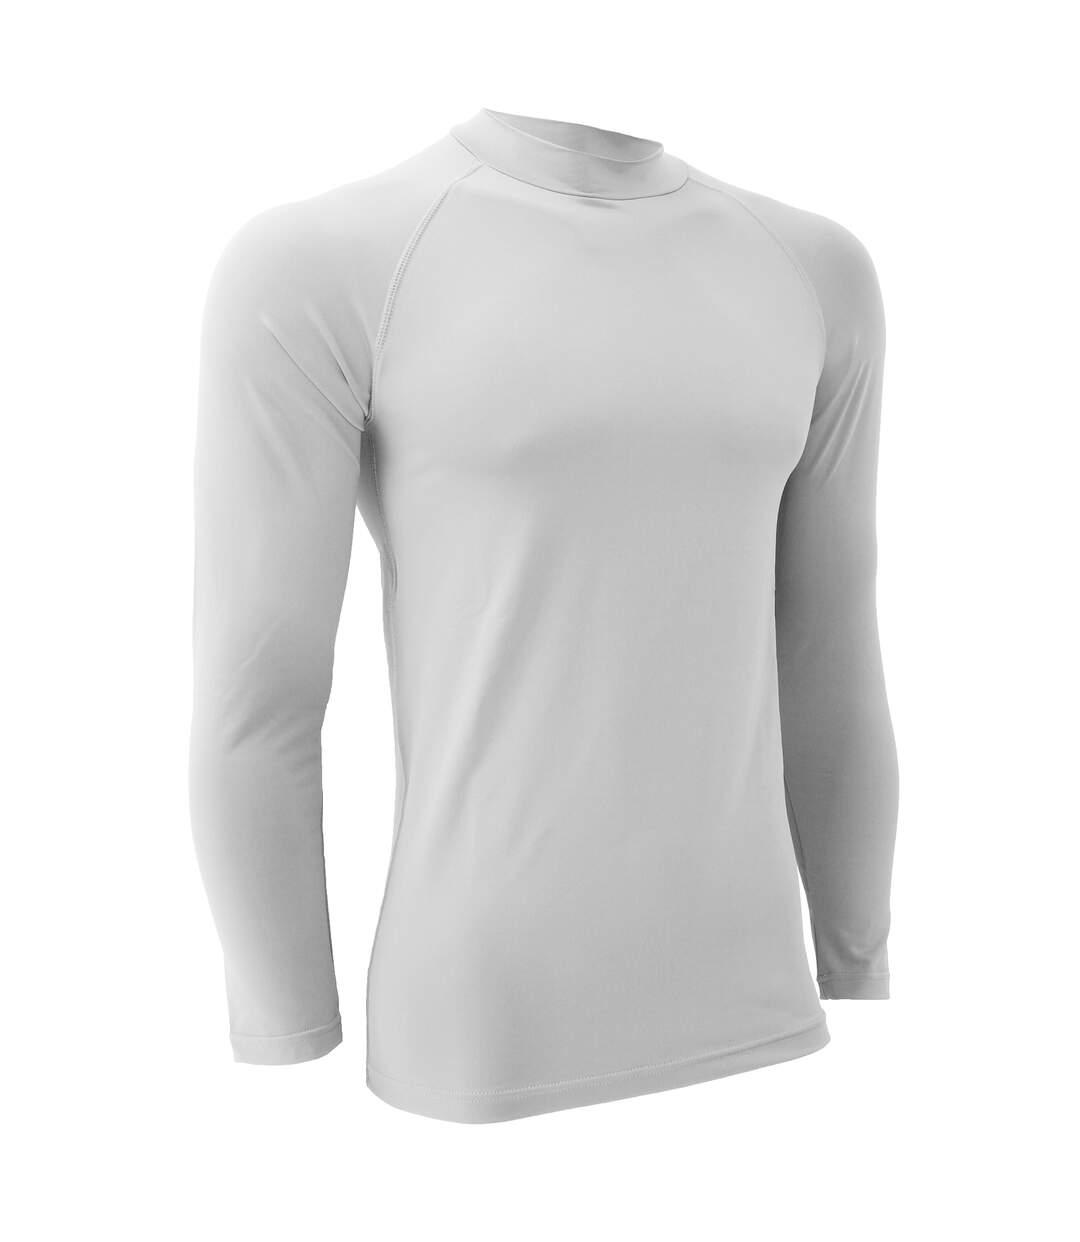 Finden & Hales Mens Sports Long Sleeve Team Baselayer Vest (White) - UTRW411